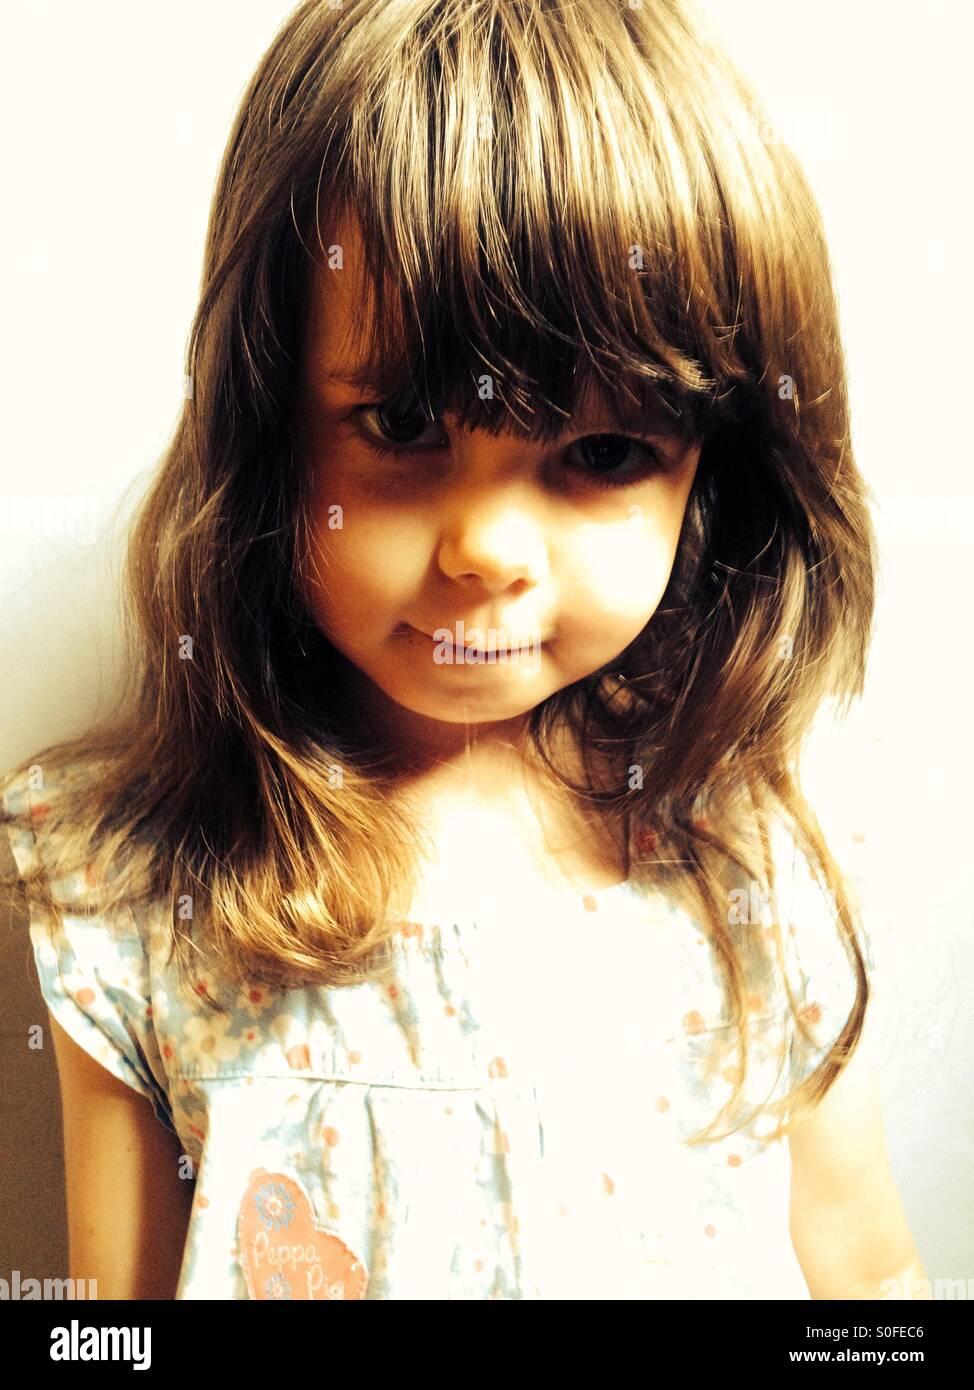 Retrato de niña de 3 años Imagen De Stock